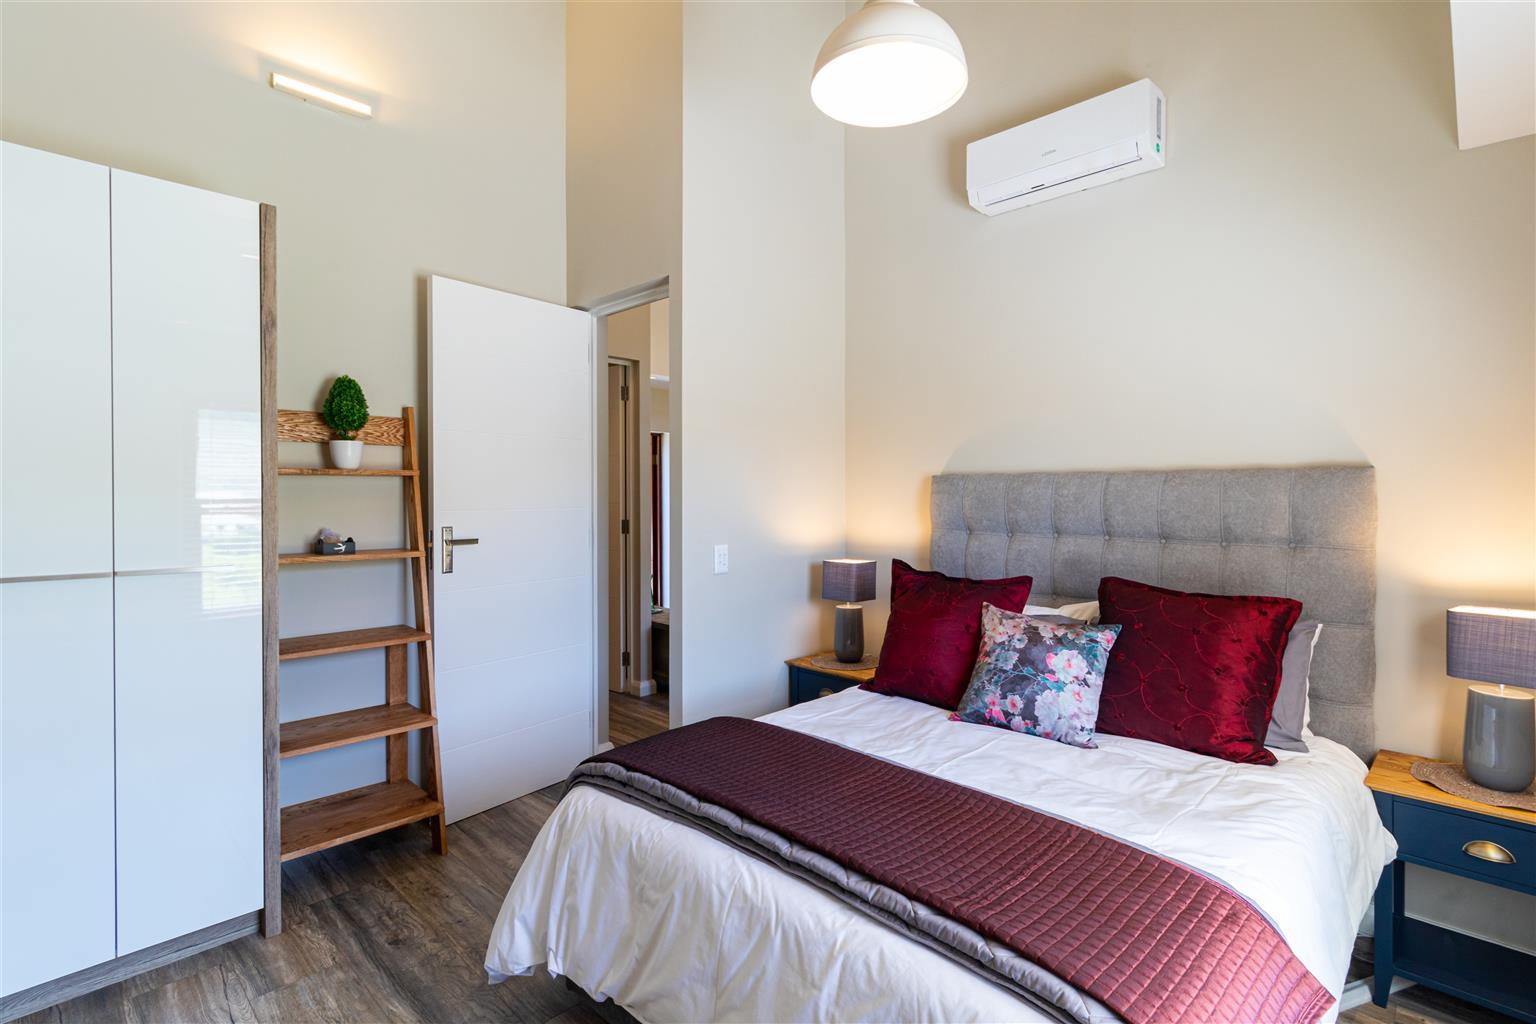 Wilderness - Short Term Rental - 2 Bedroom Apartment